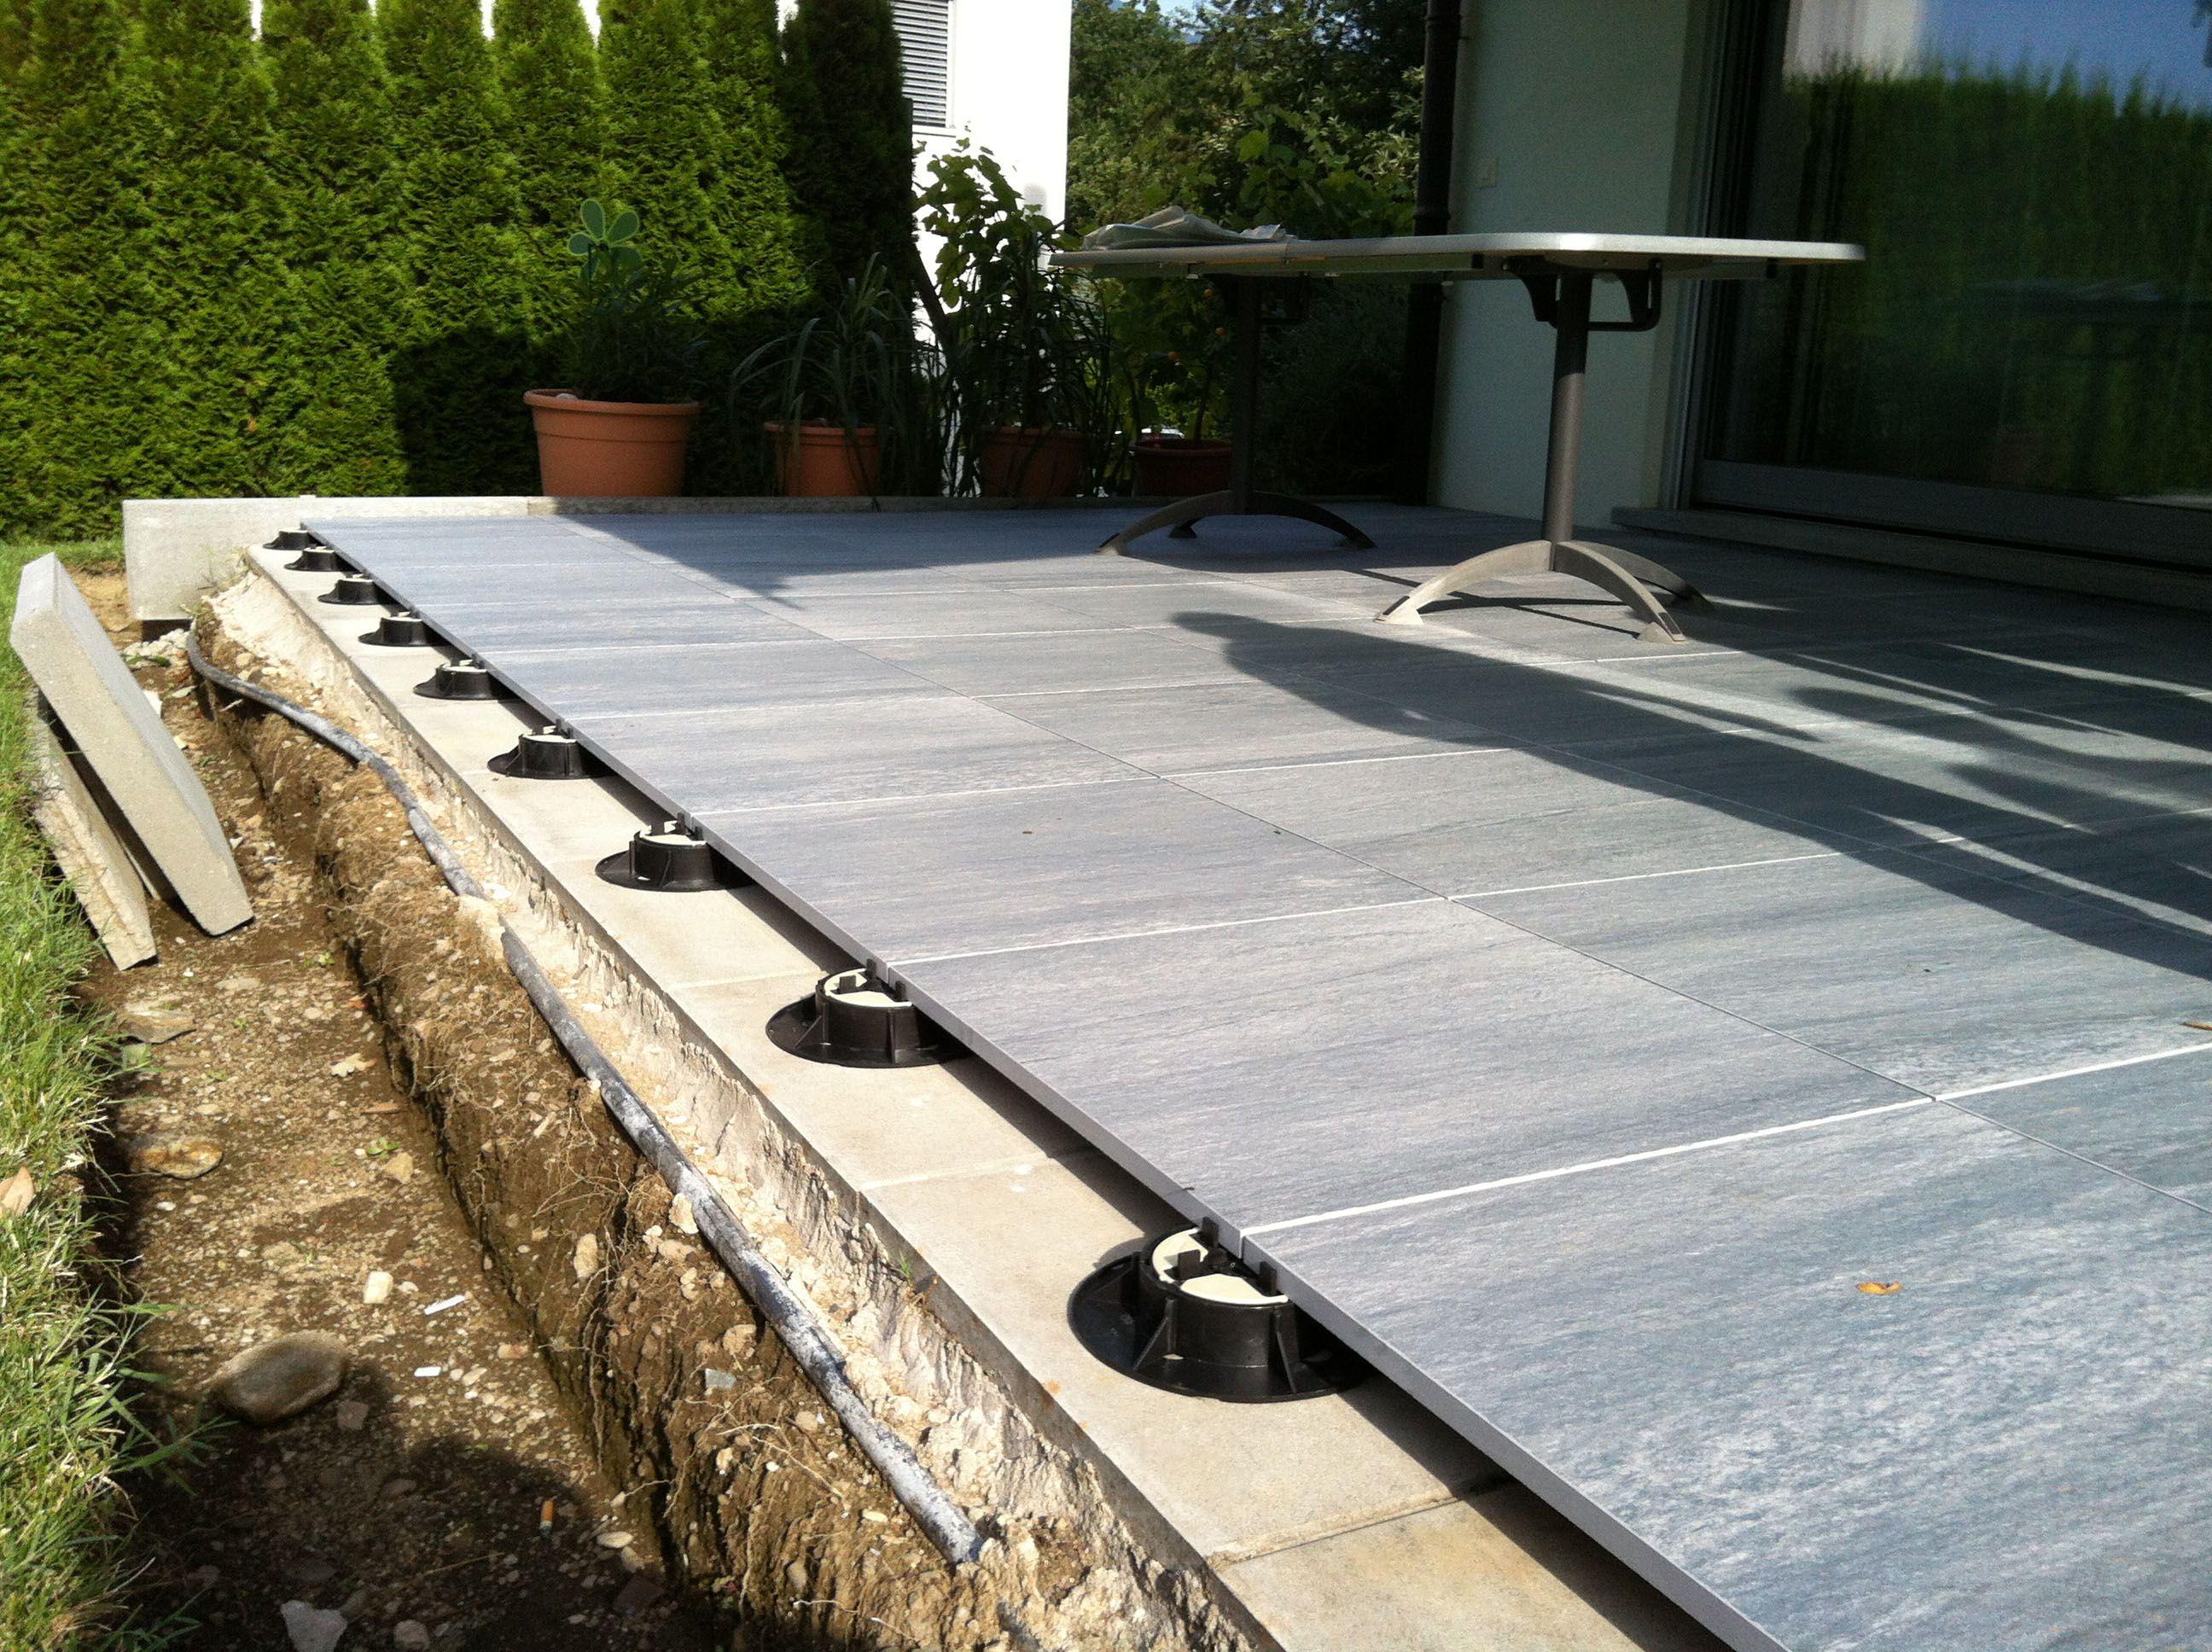 Residential Roof Top Pedestal Decking